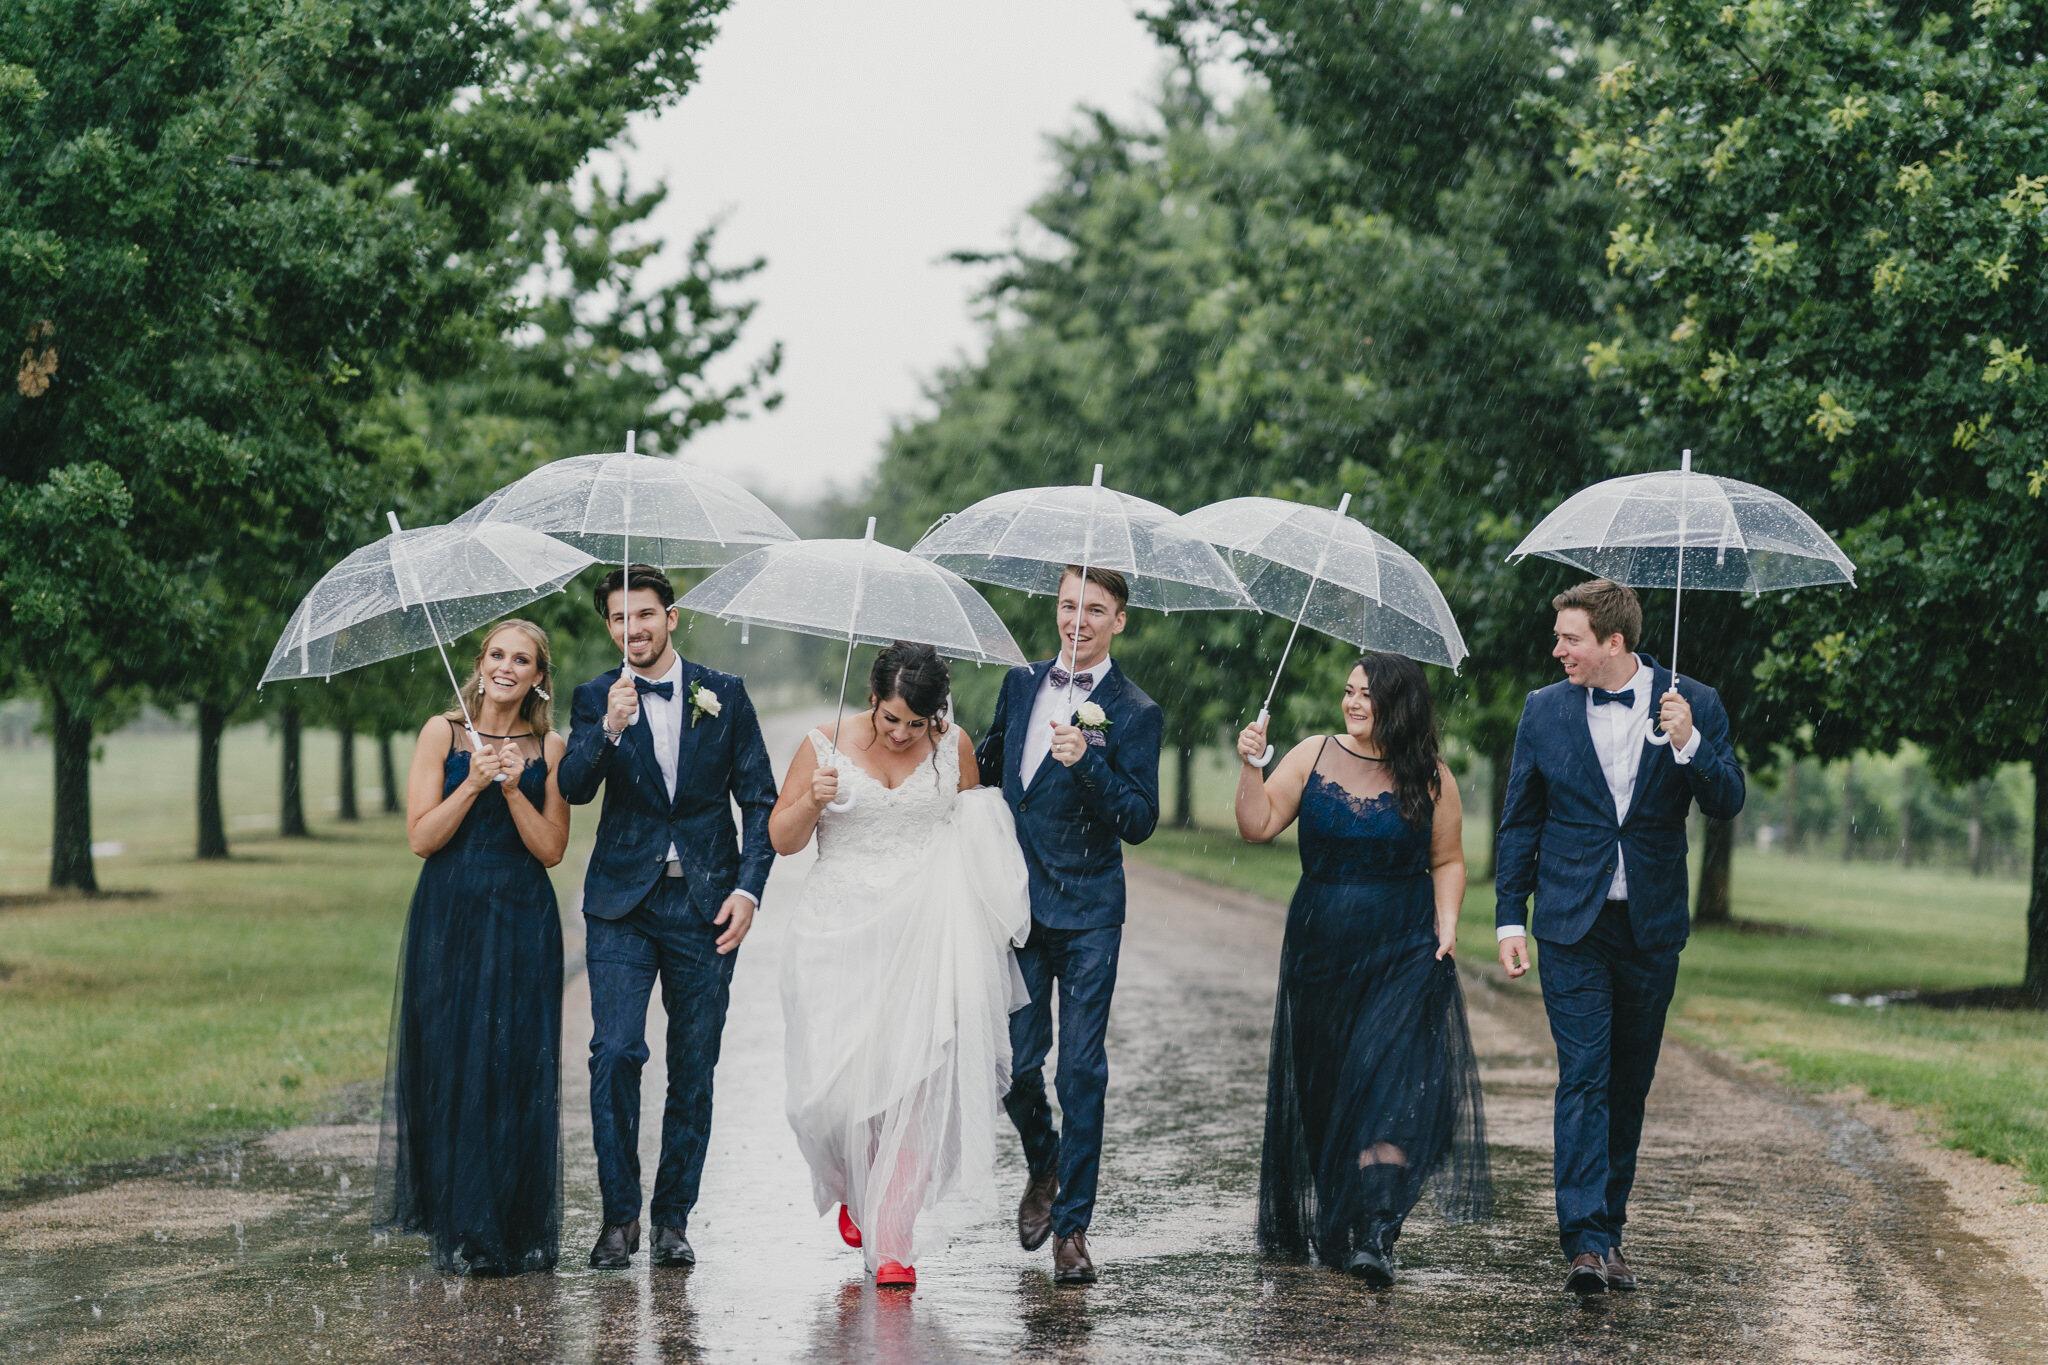 Corey Wright Stones Yarra Valley Wedding Photography_031.jpg